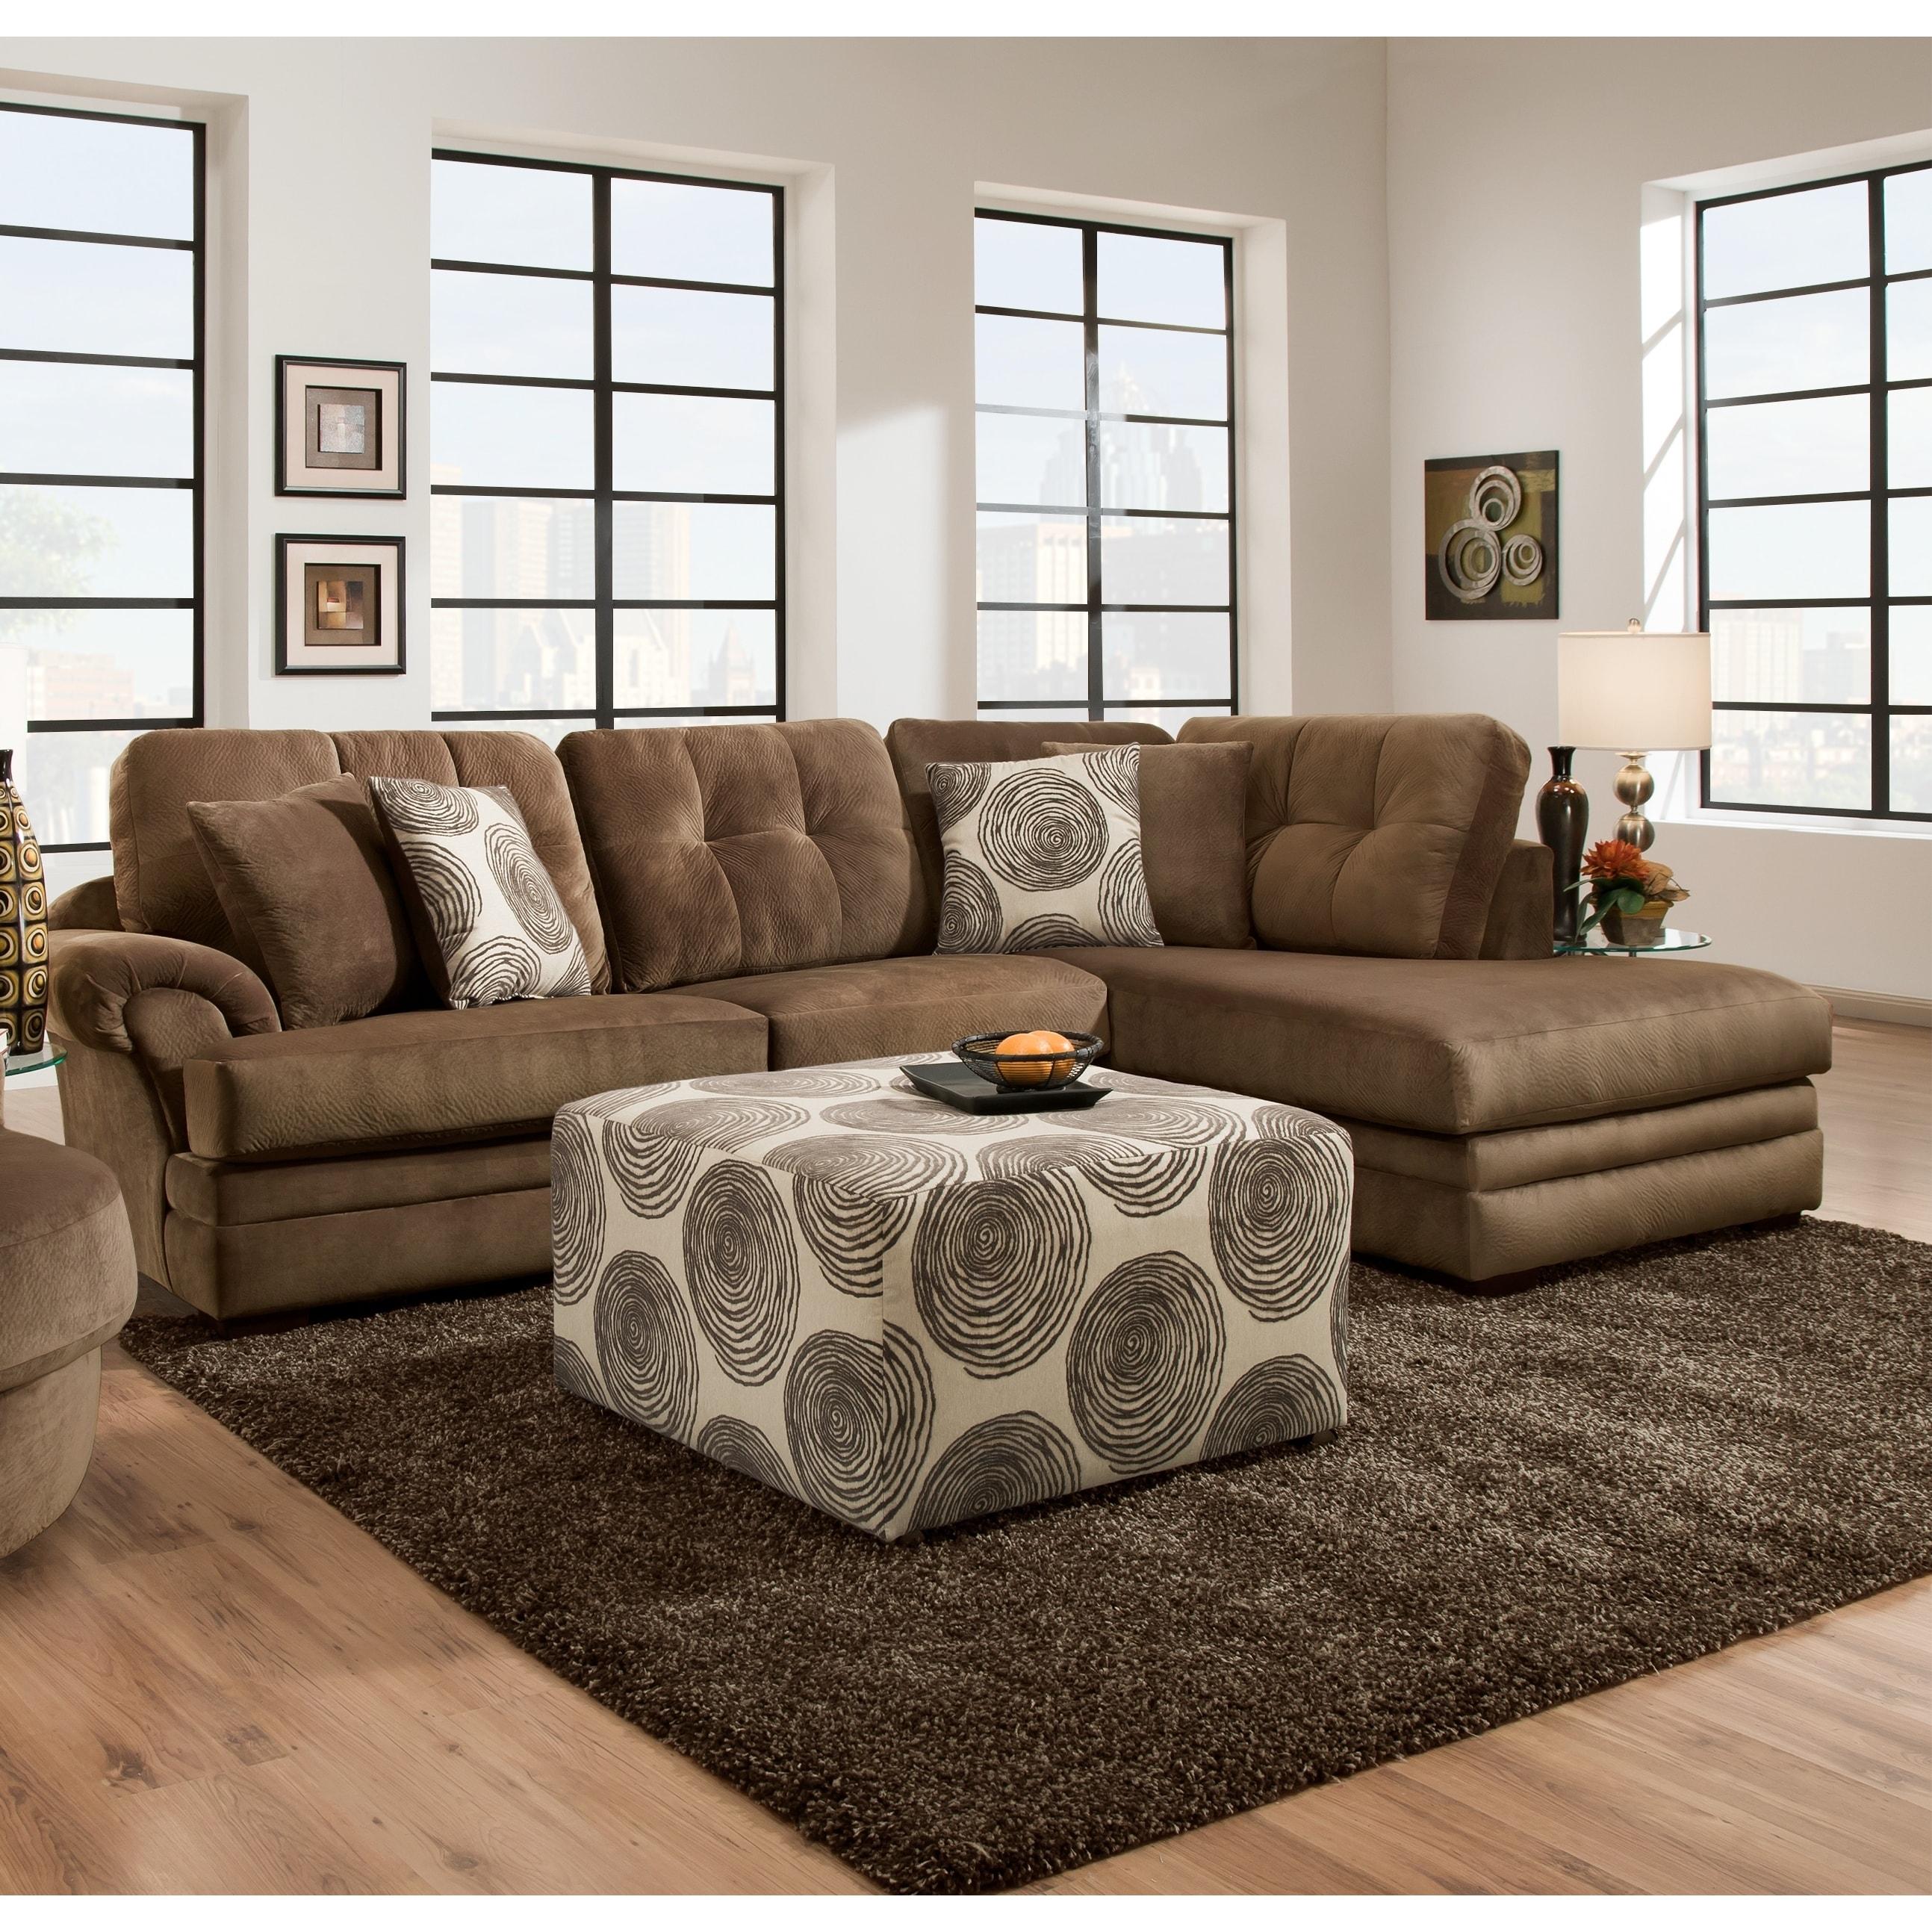 Anna Clogs Sofa Trendz Plush Grey/Brown Velvet/Fabric Sec...